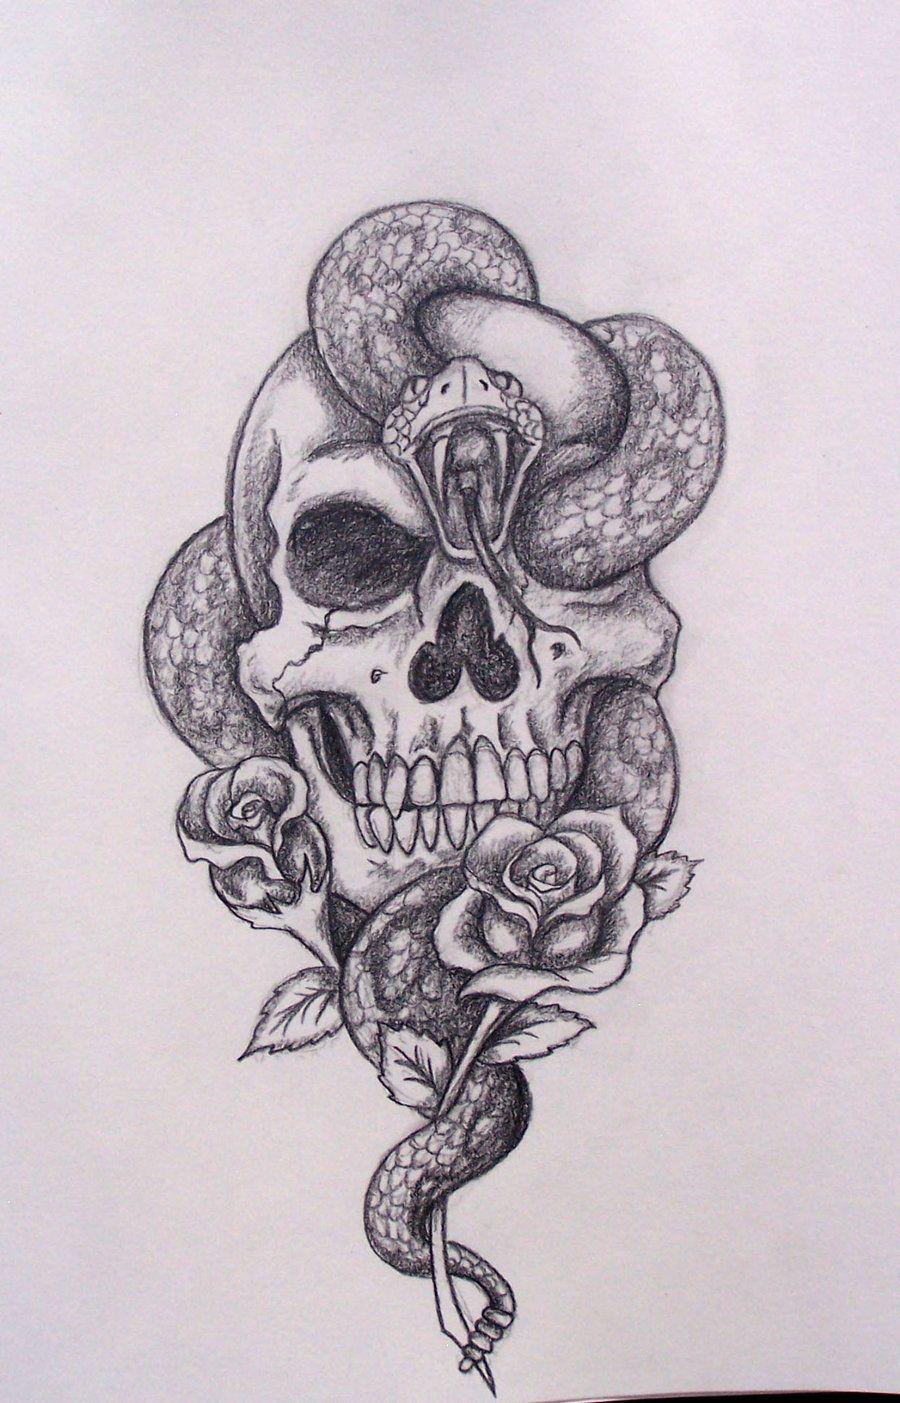 Pin by romy robillard on tattoos i vant pinterest snake tattoo snake and skull w roses thecheapjerseys Gallery